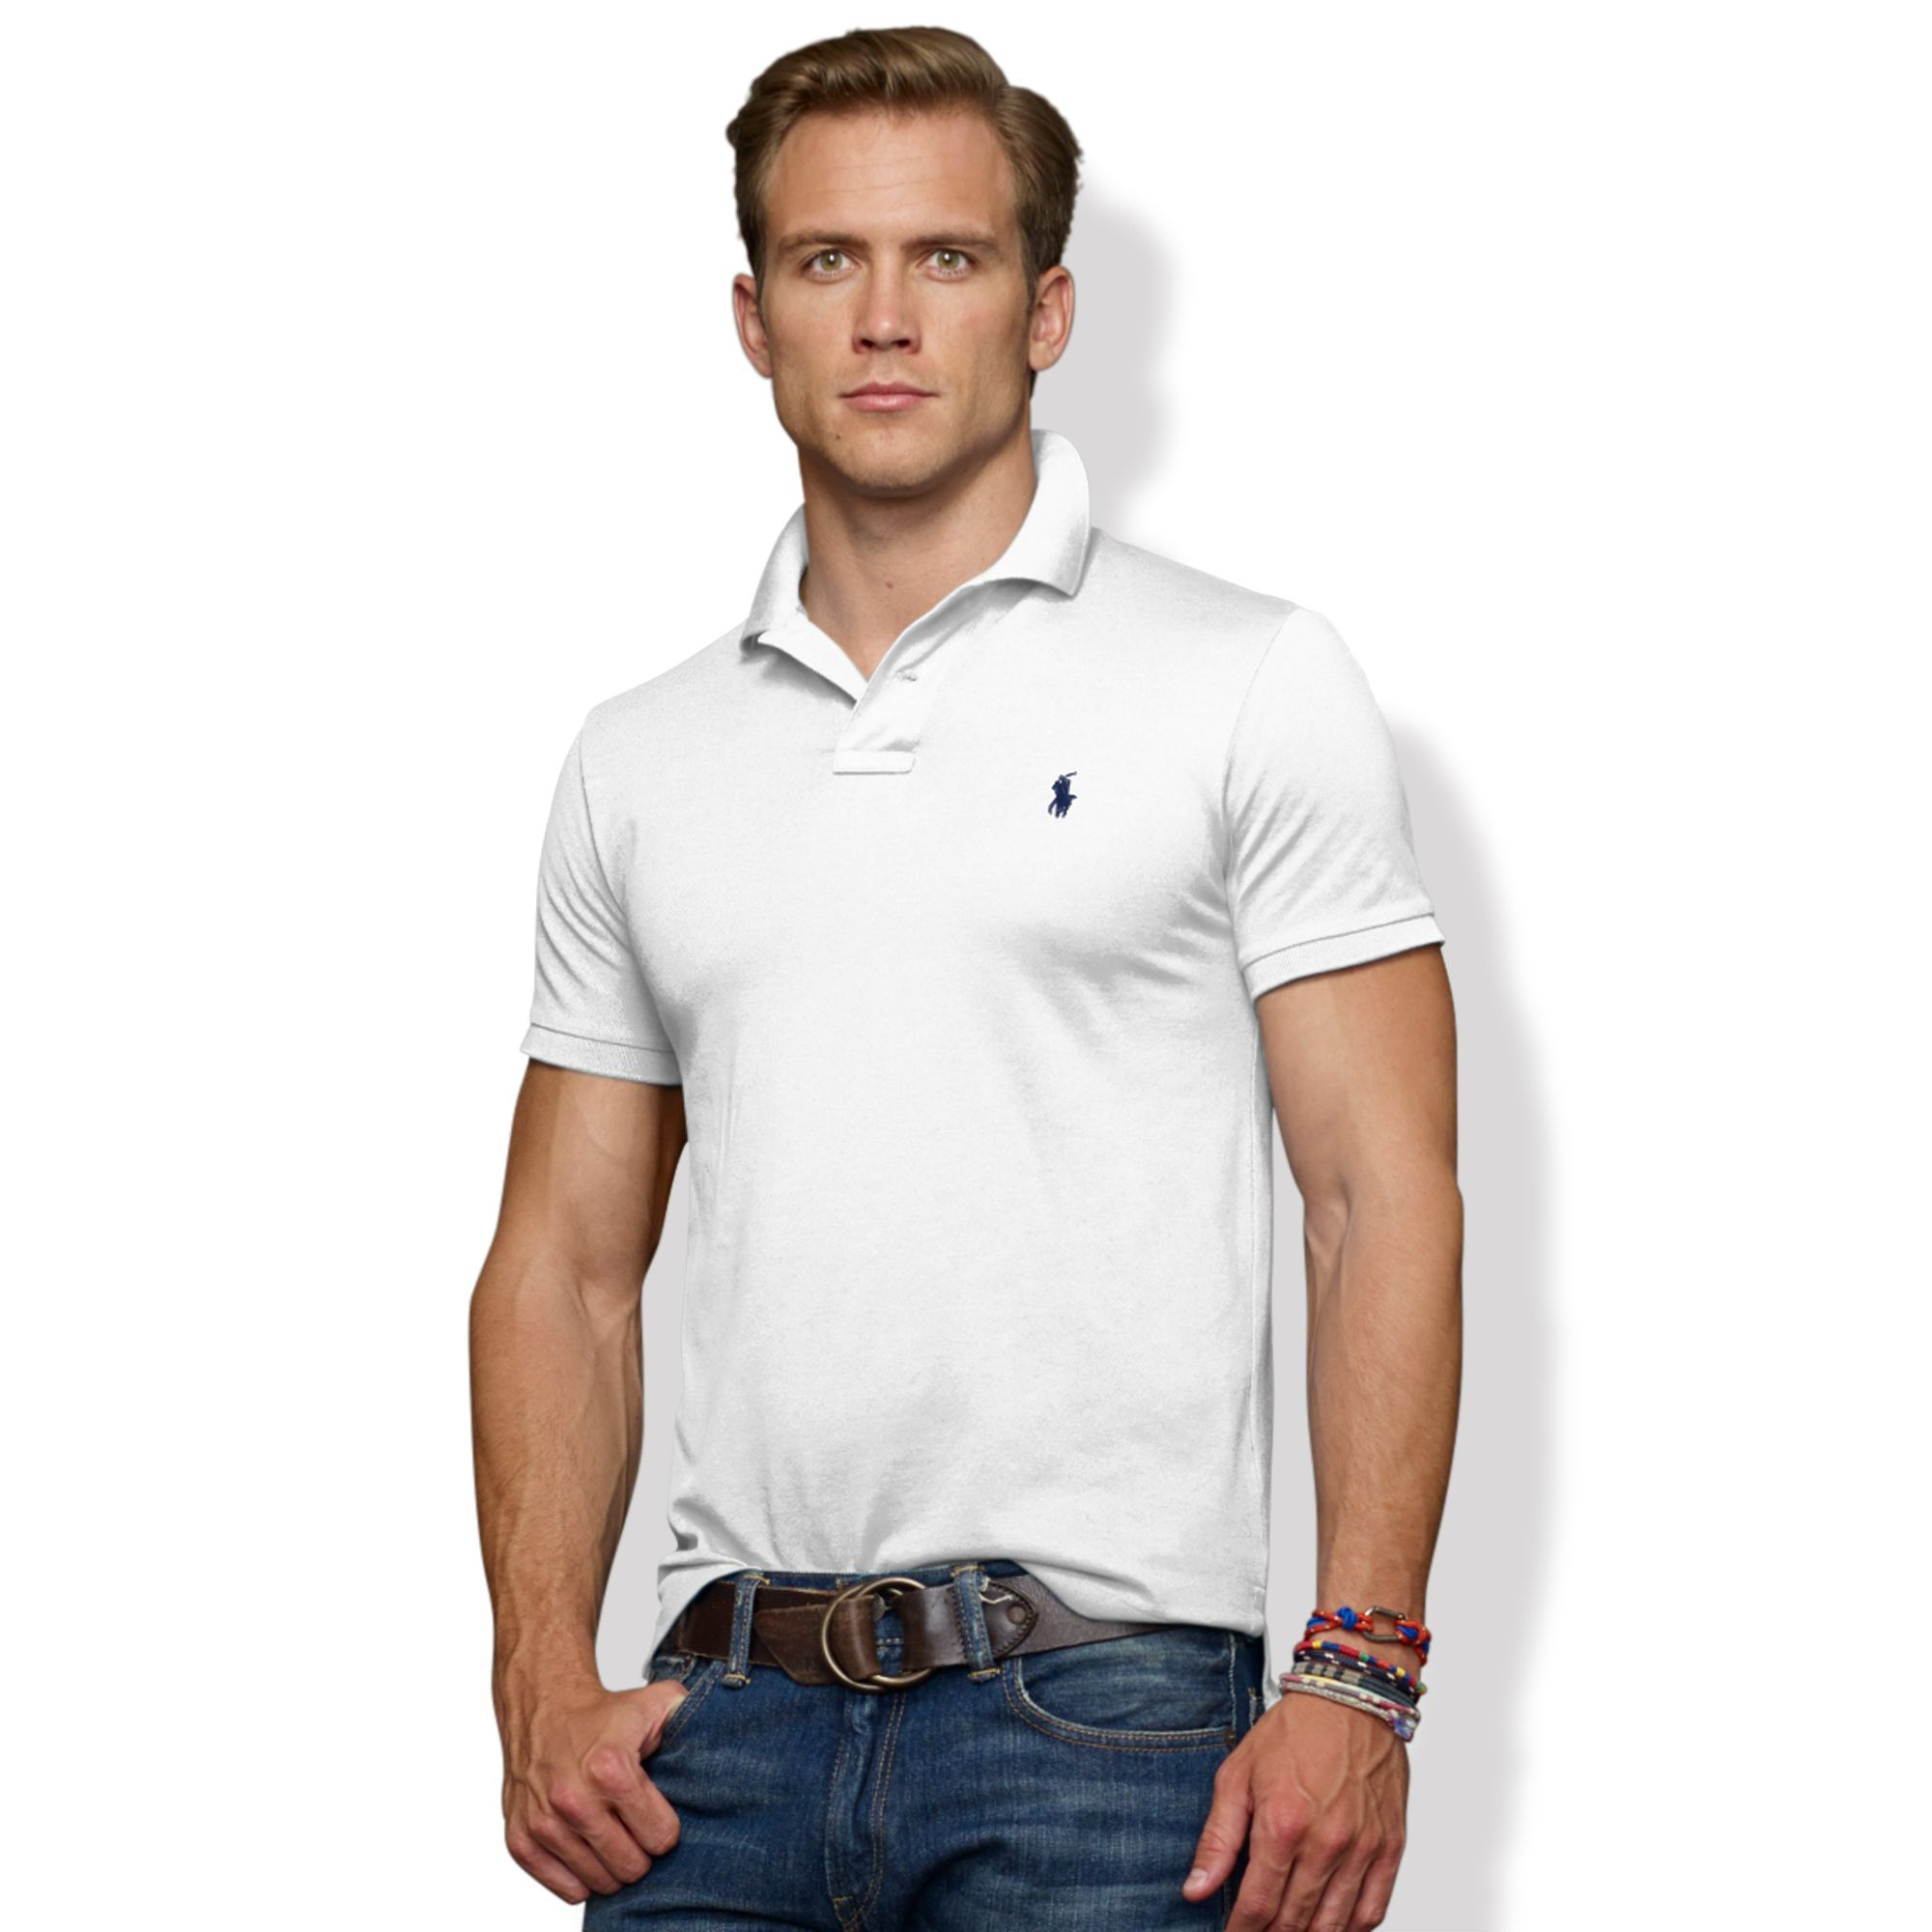 Pour Polo Ralph Boutons Fit polo Slim Fit Lauren 2 Pnw0Ok